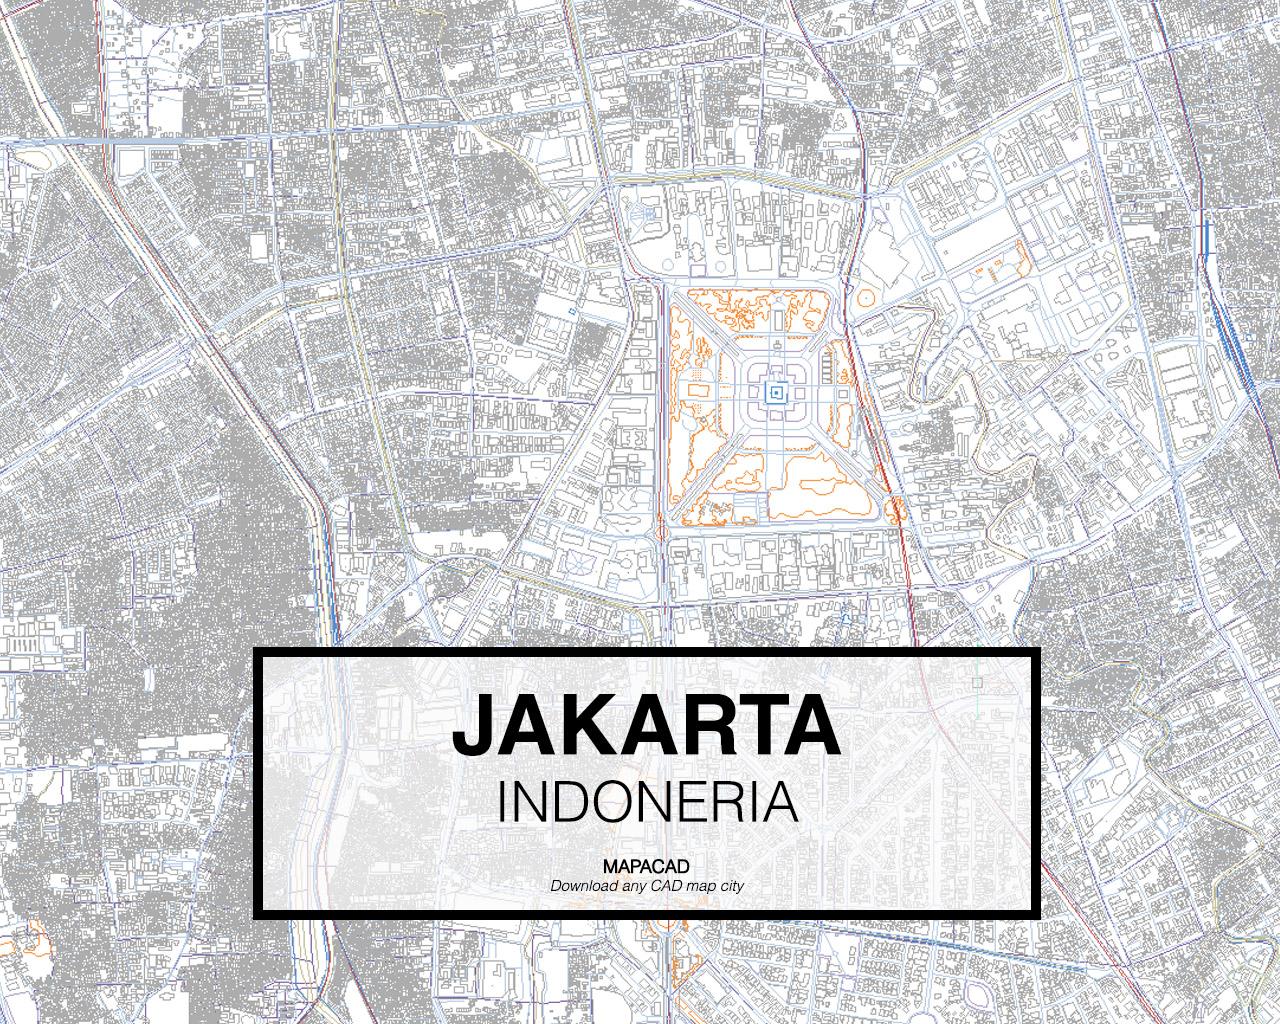 Jakarta-Indonesia-V02-02-Mapacad-download-map-cad-dwg-dxf-autocad-free-2d-3d